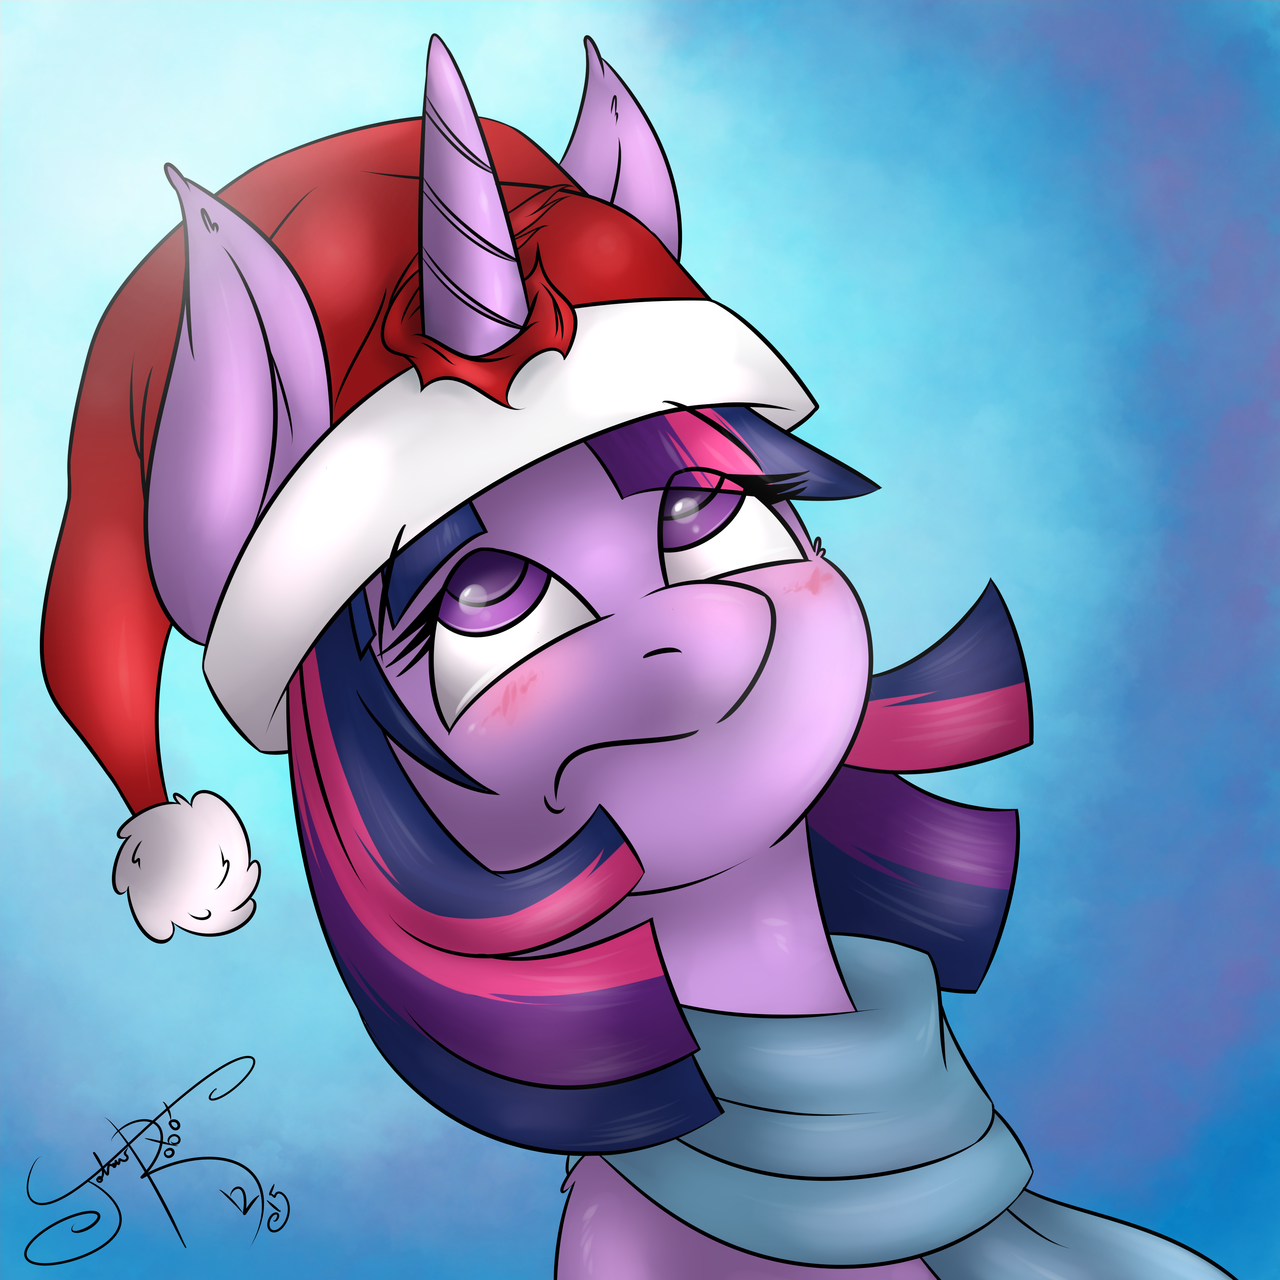 Drawn santa hat mlp Santa  by Dumb com